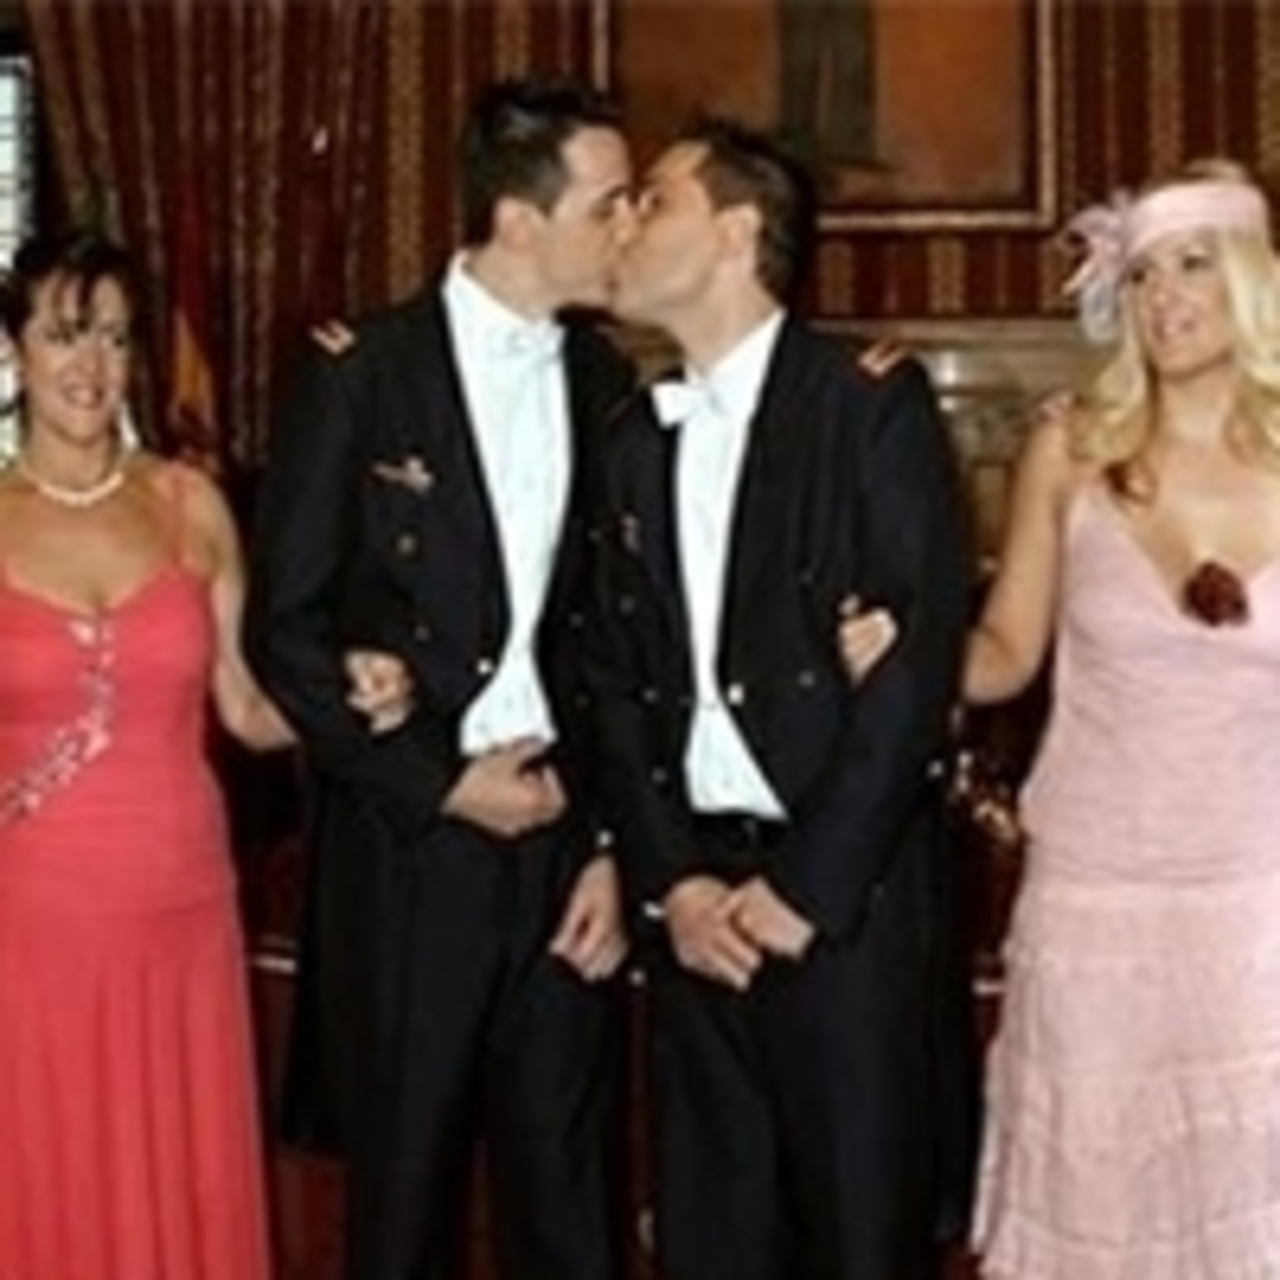 gei-v-svadebnom-plate